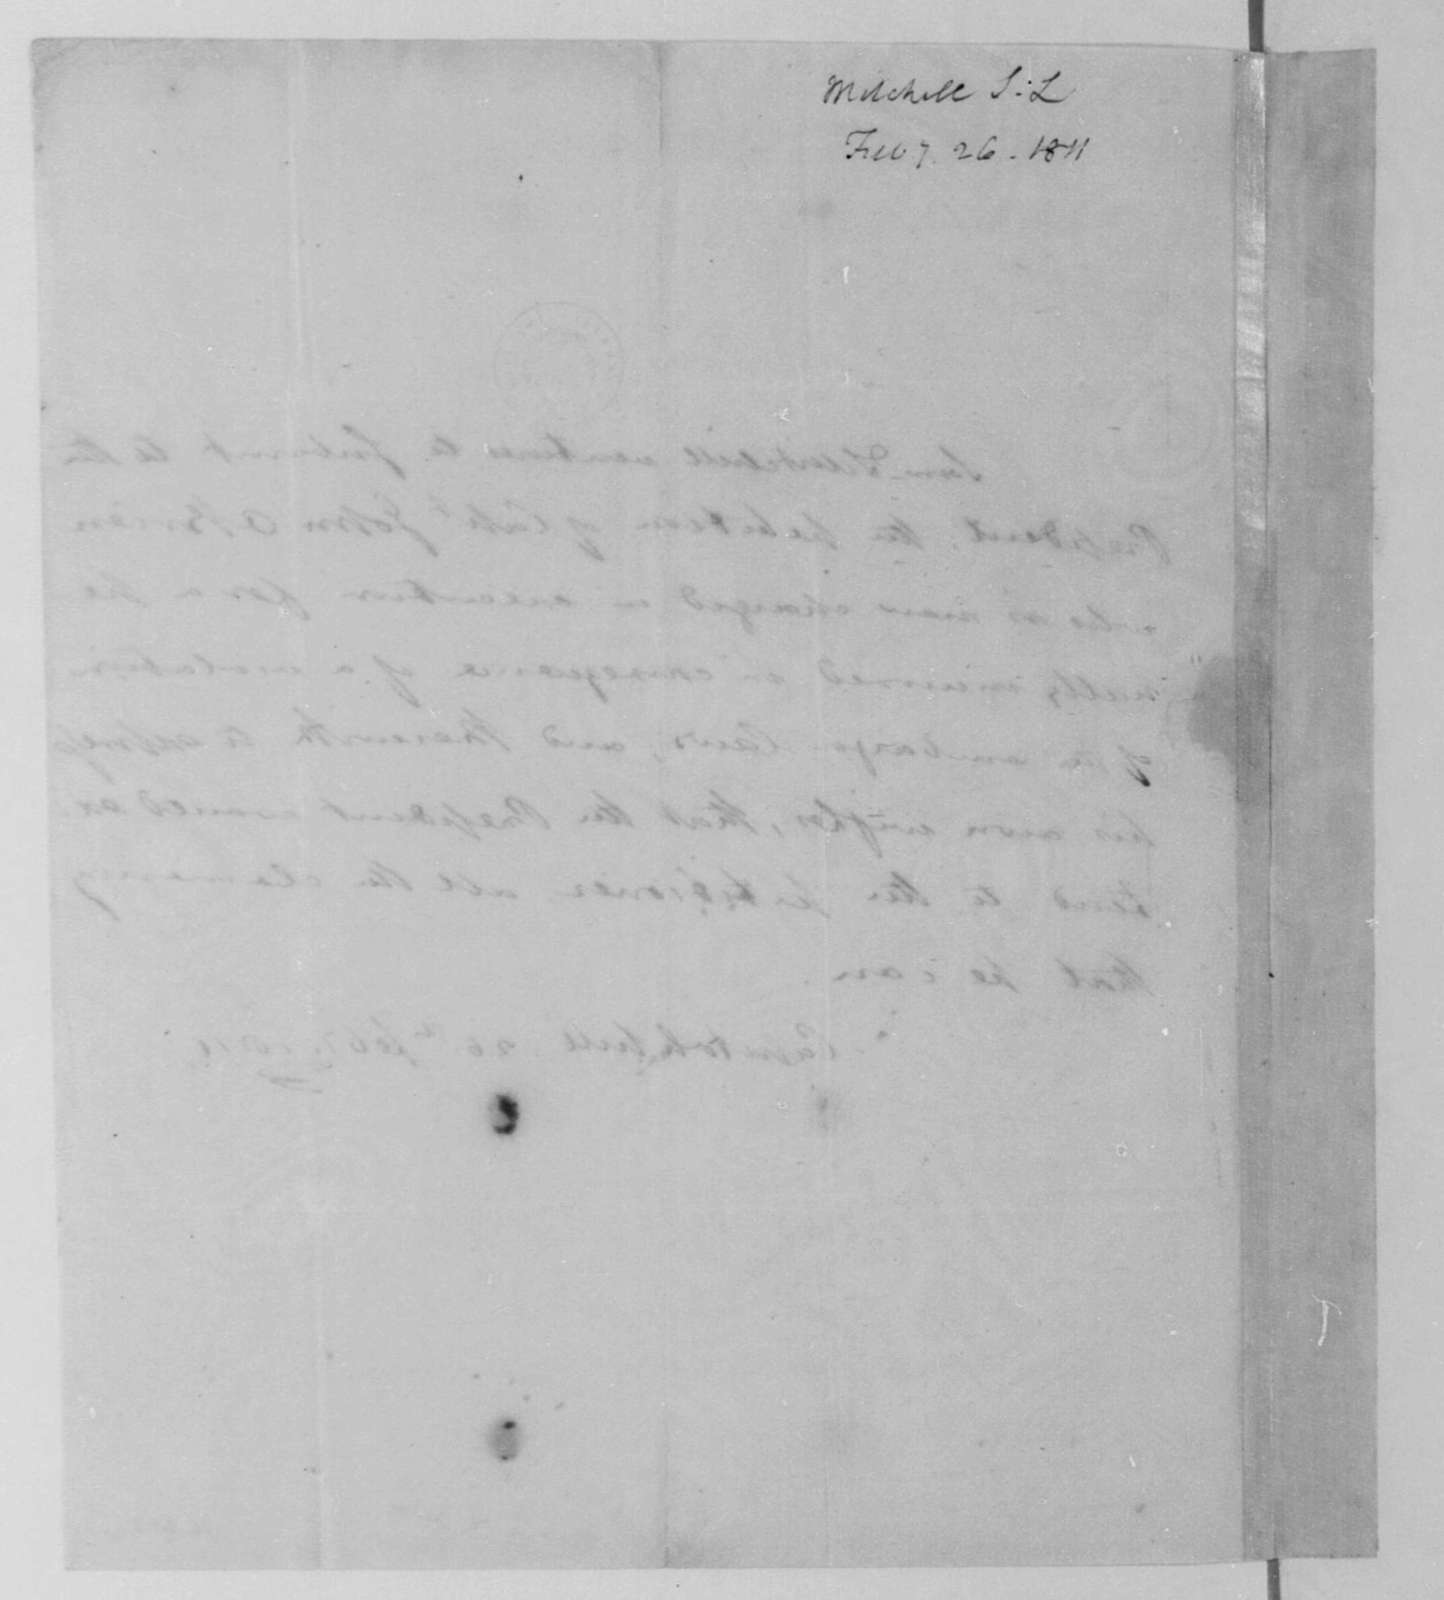 Samuel L. Mitchill to James Madison, February 26, 1811.